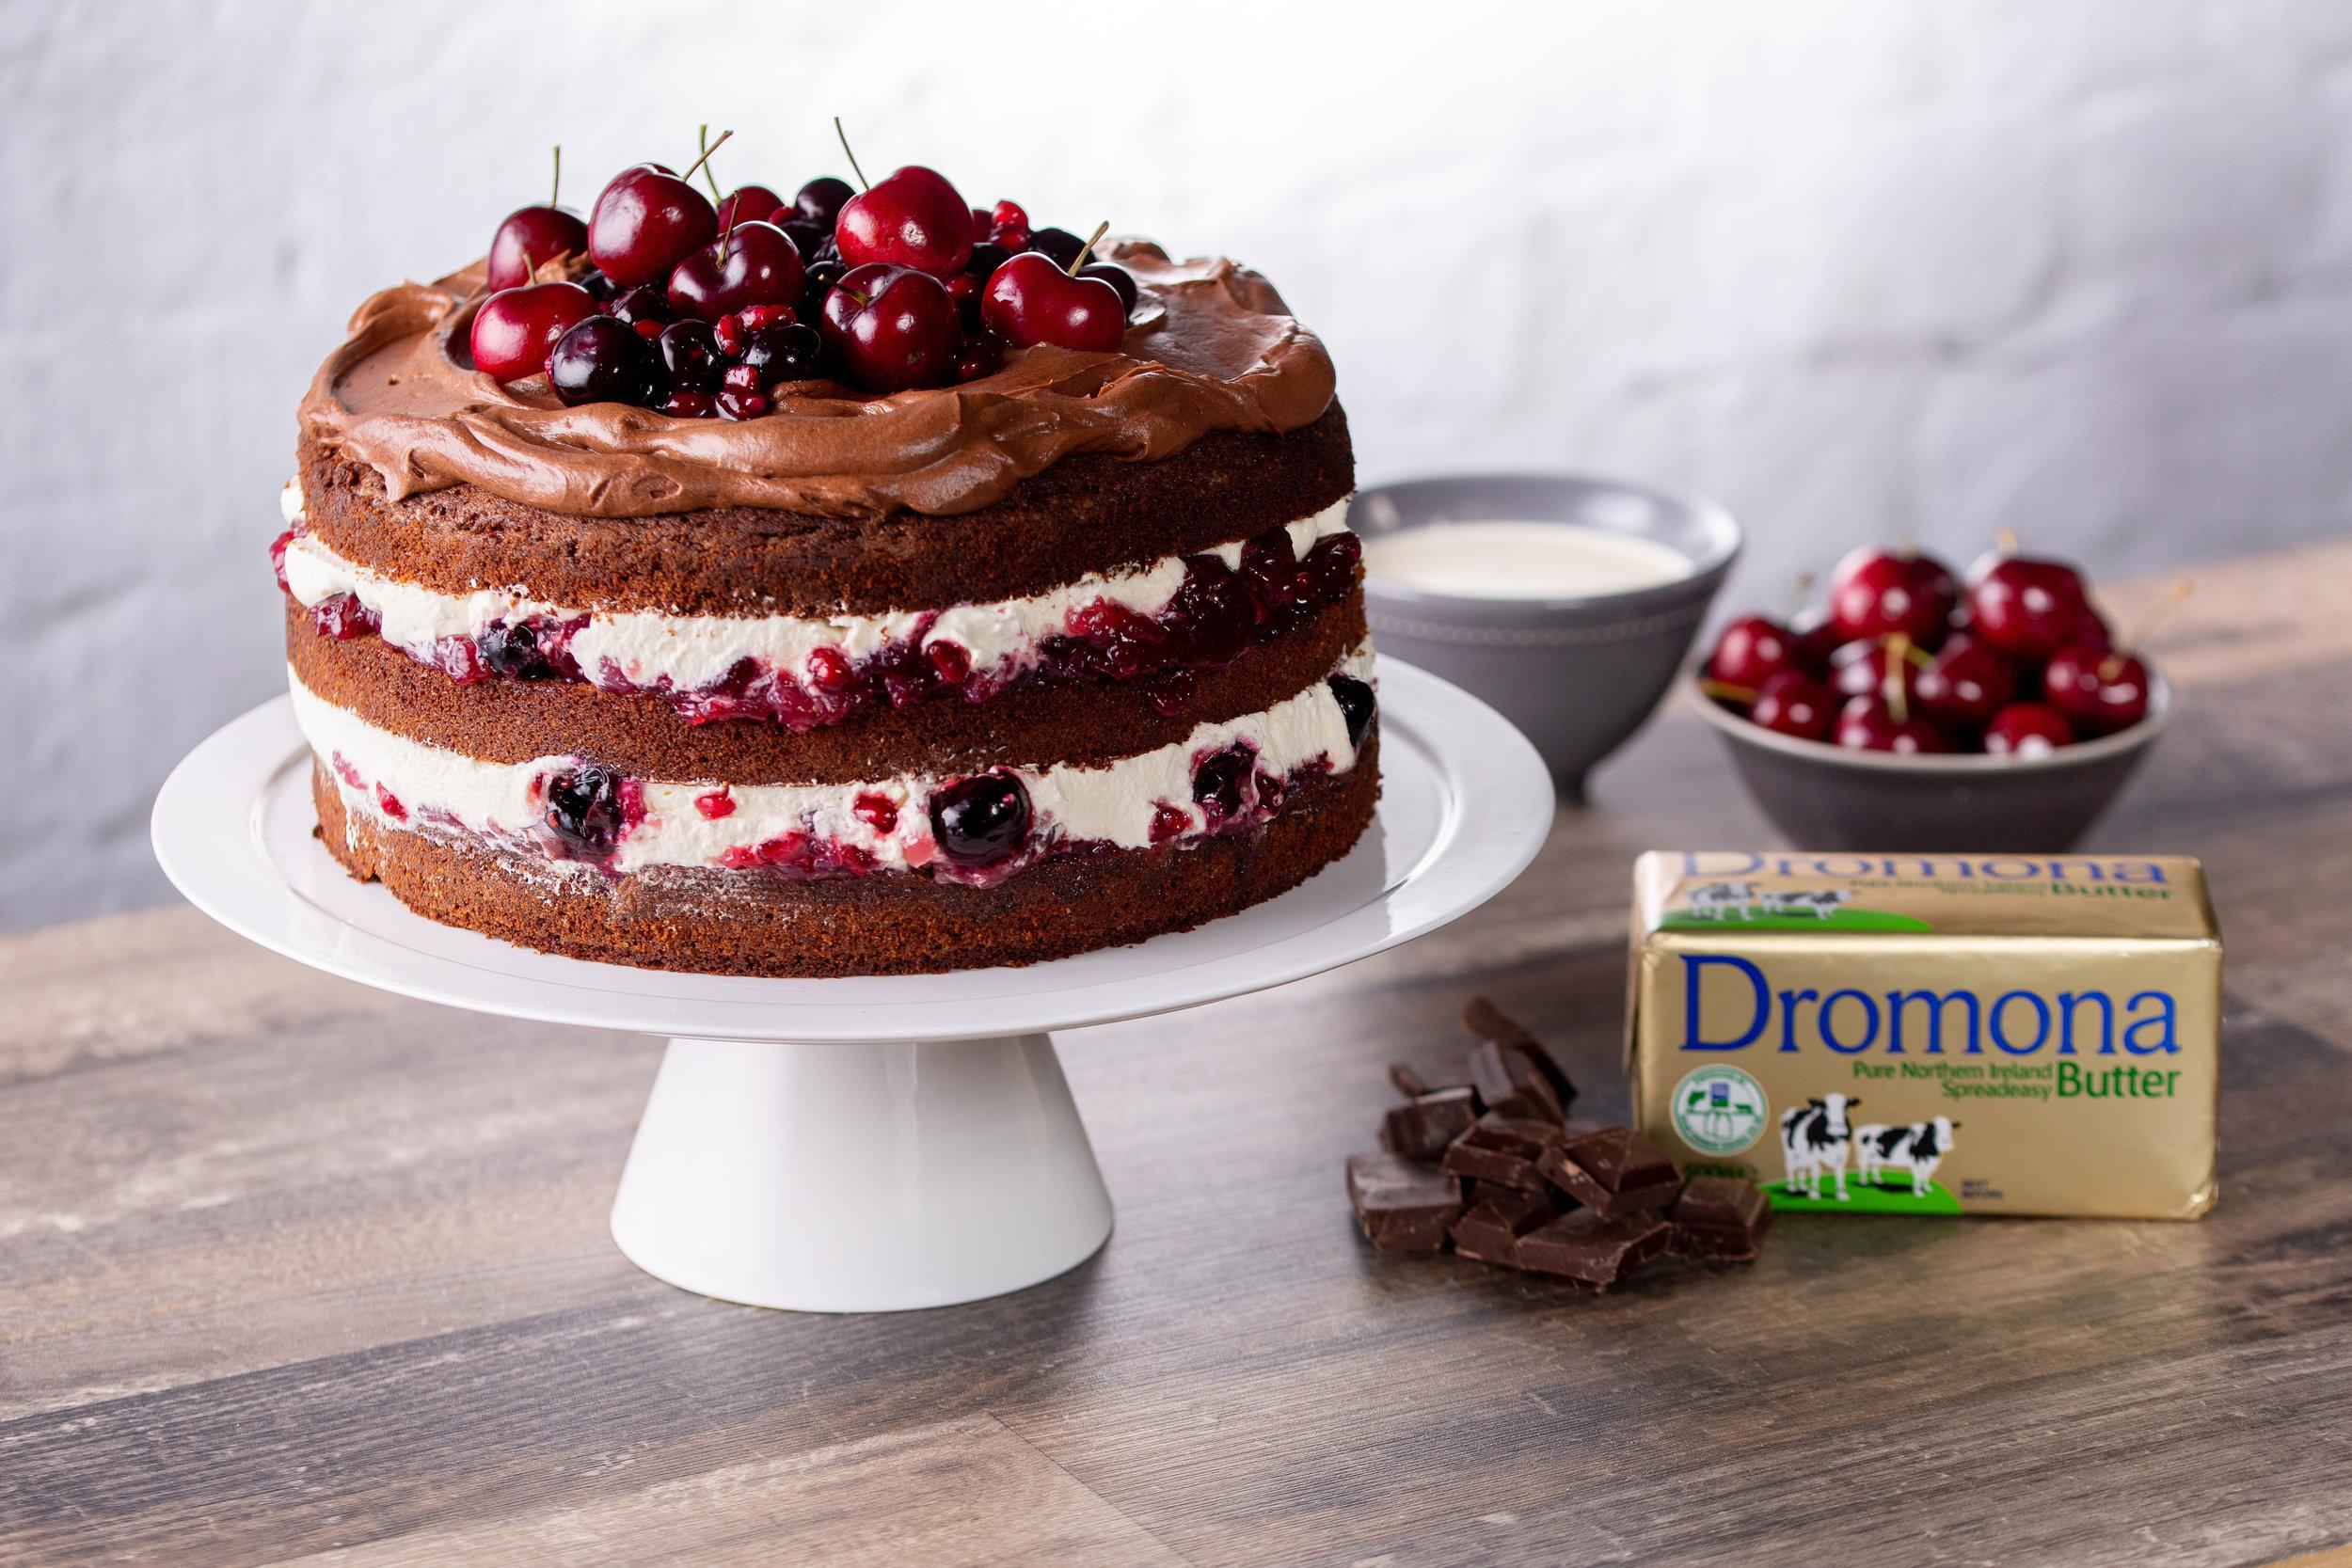 Dromona-497.jpg